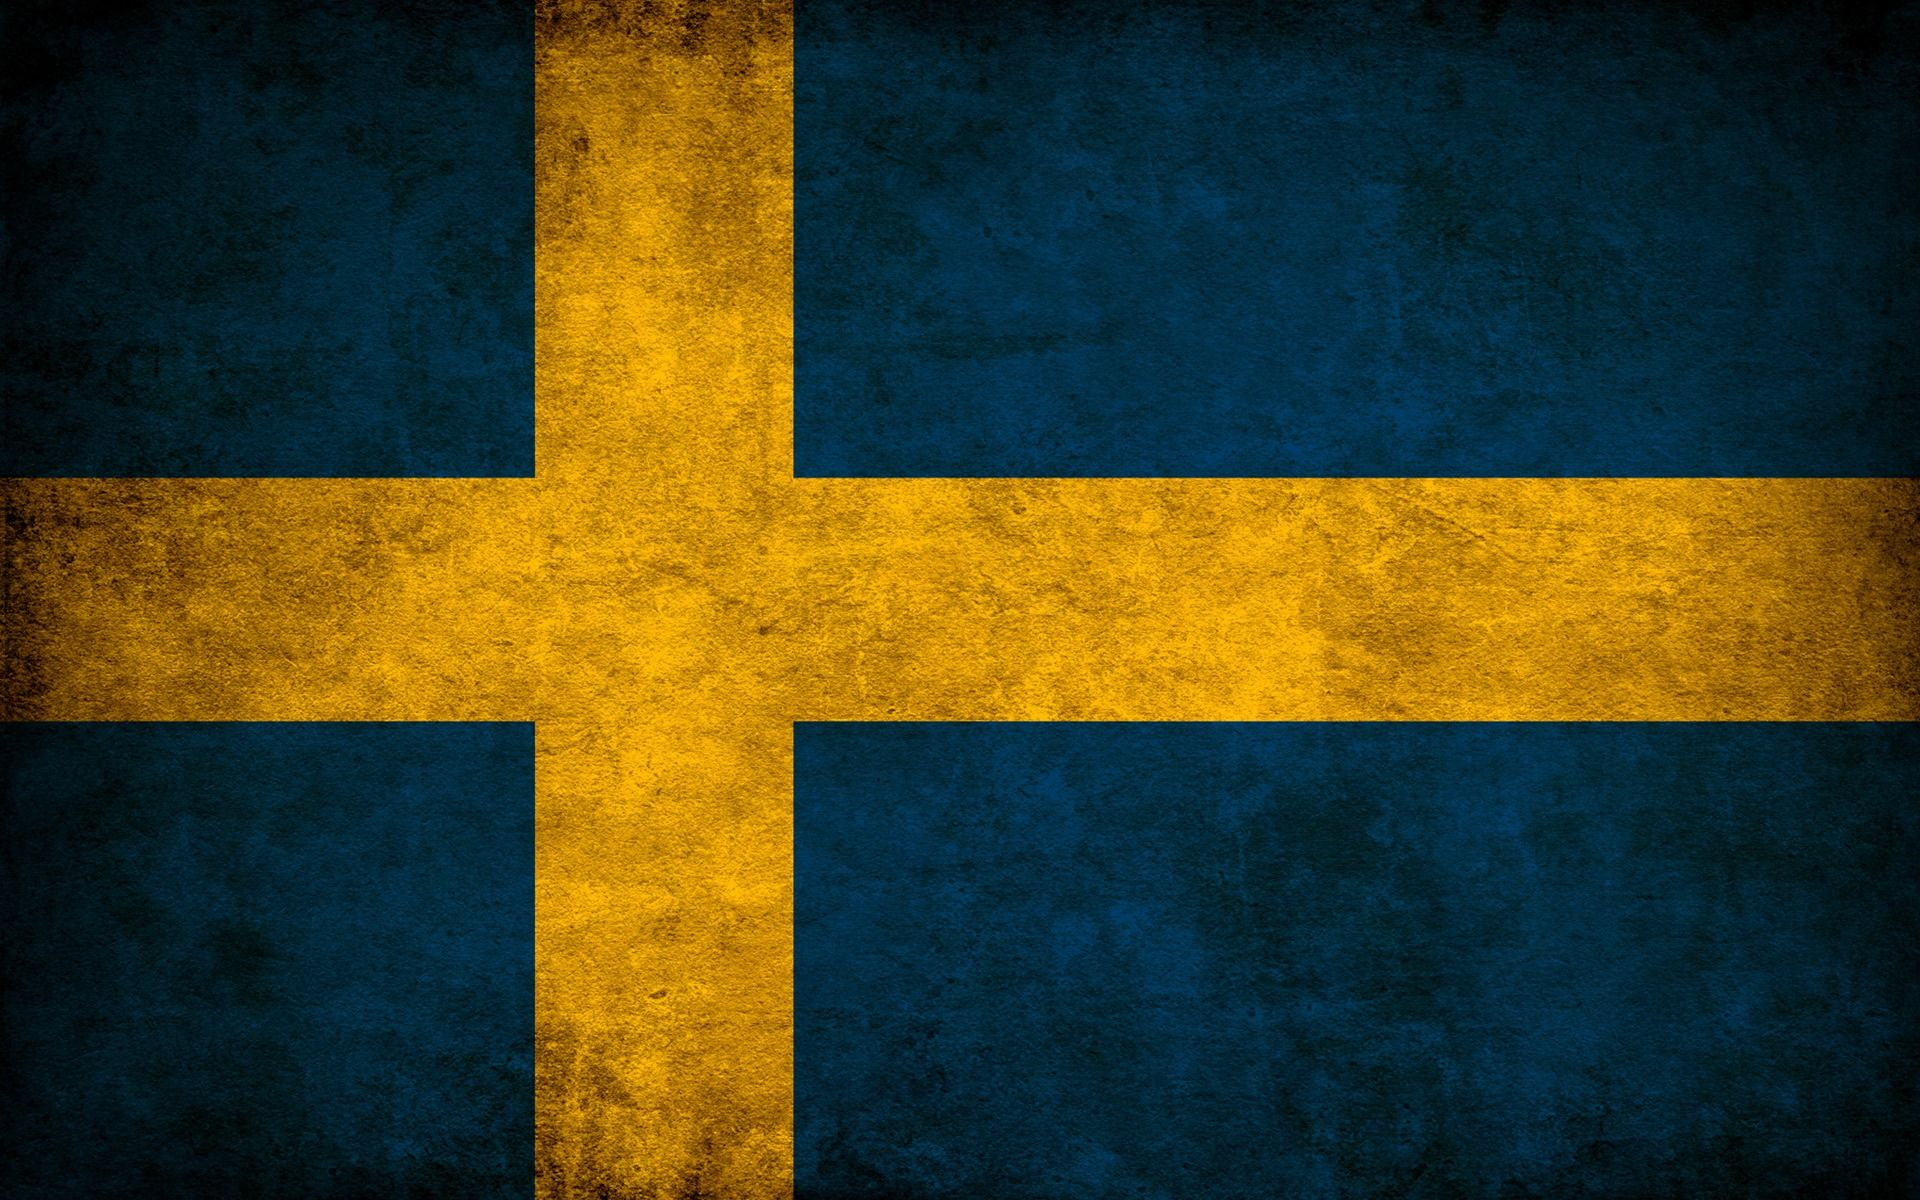 Free Swedish Lessons And Swedish Language Courses Swedish Flag Sweden Flag Sweden